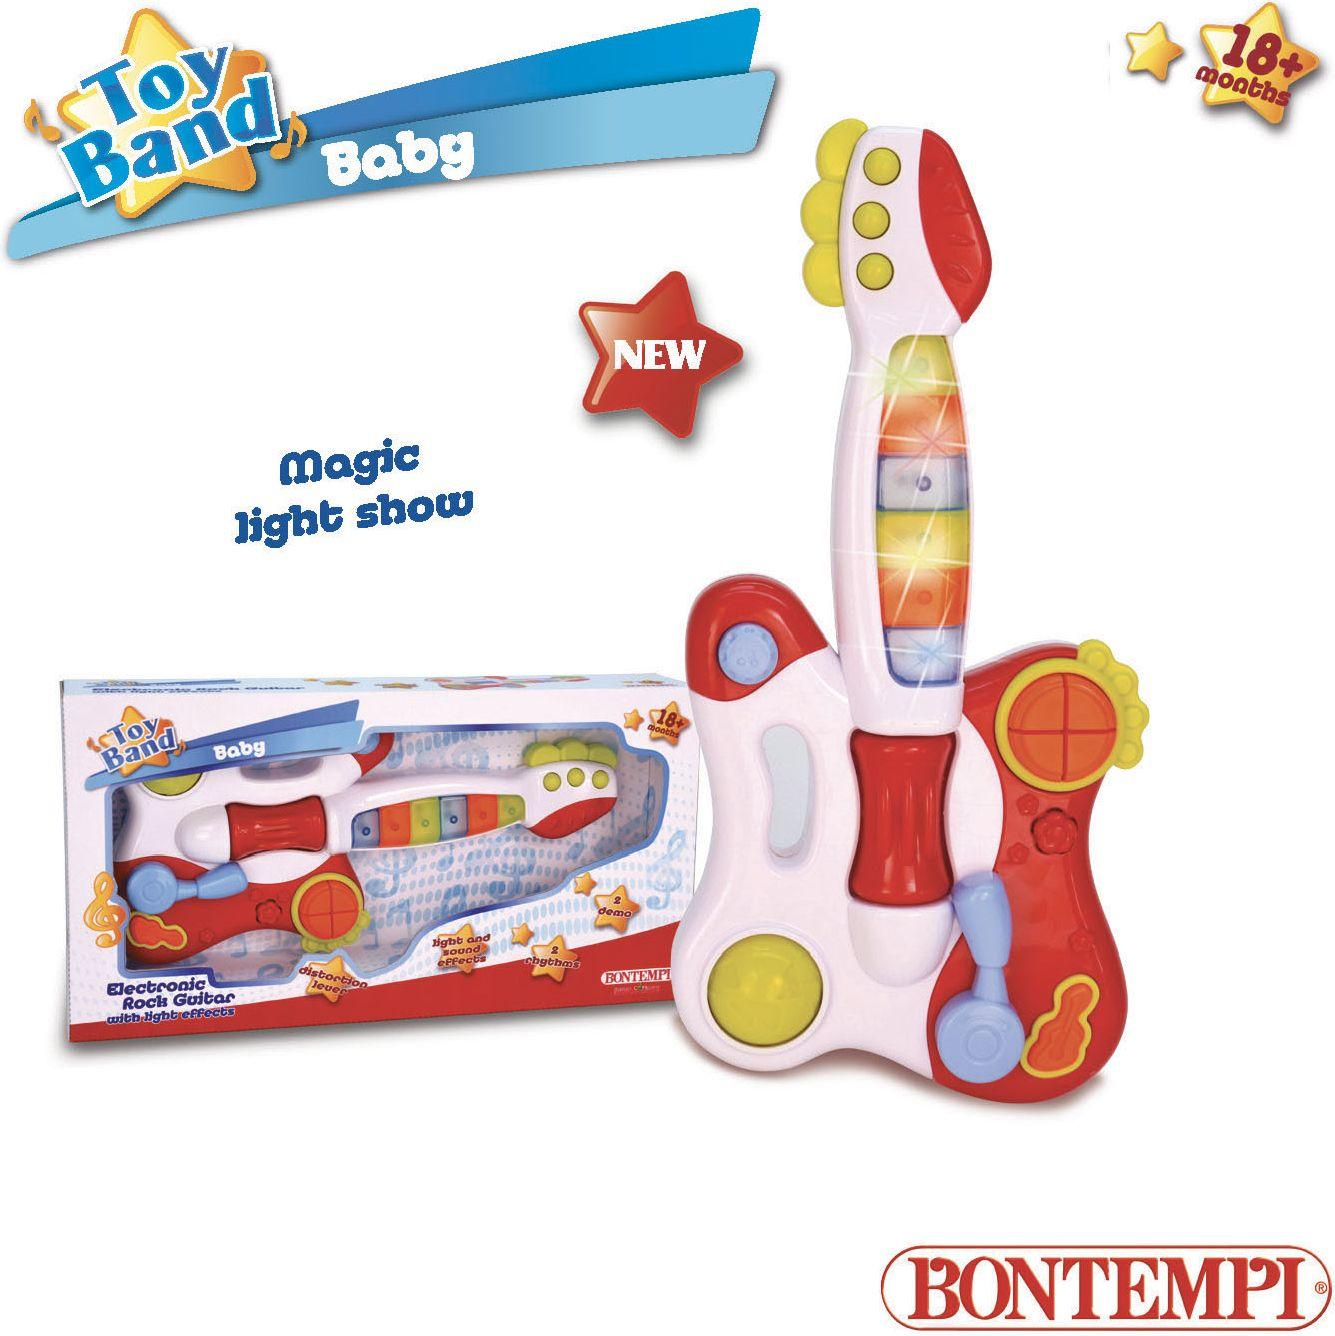 Bontempi Bontempi Baby - Gitara elektryczna DANT2403